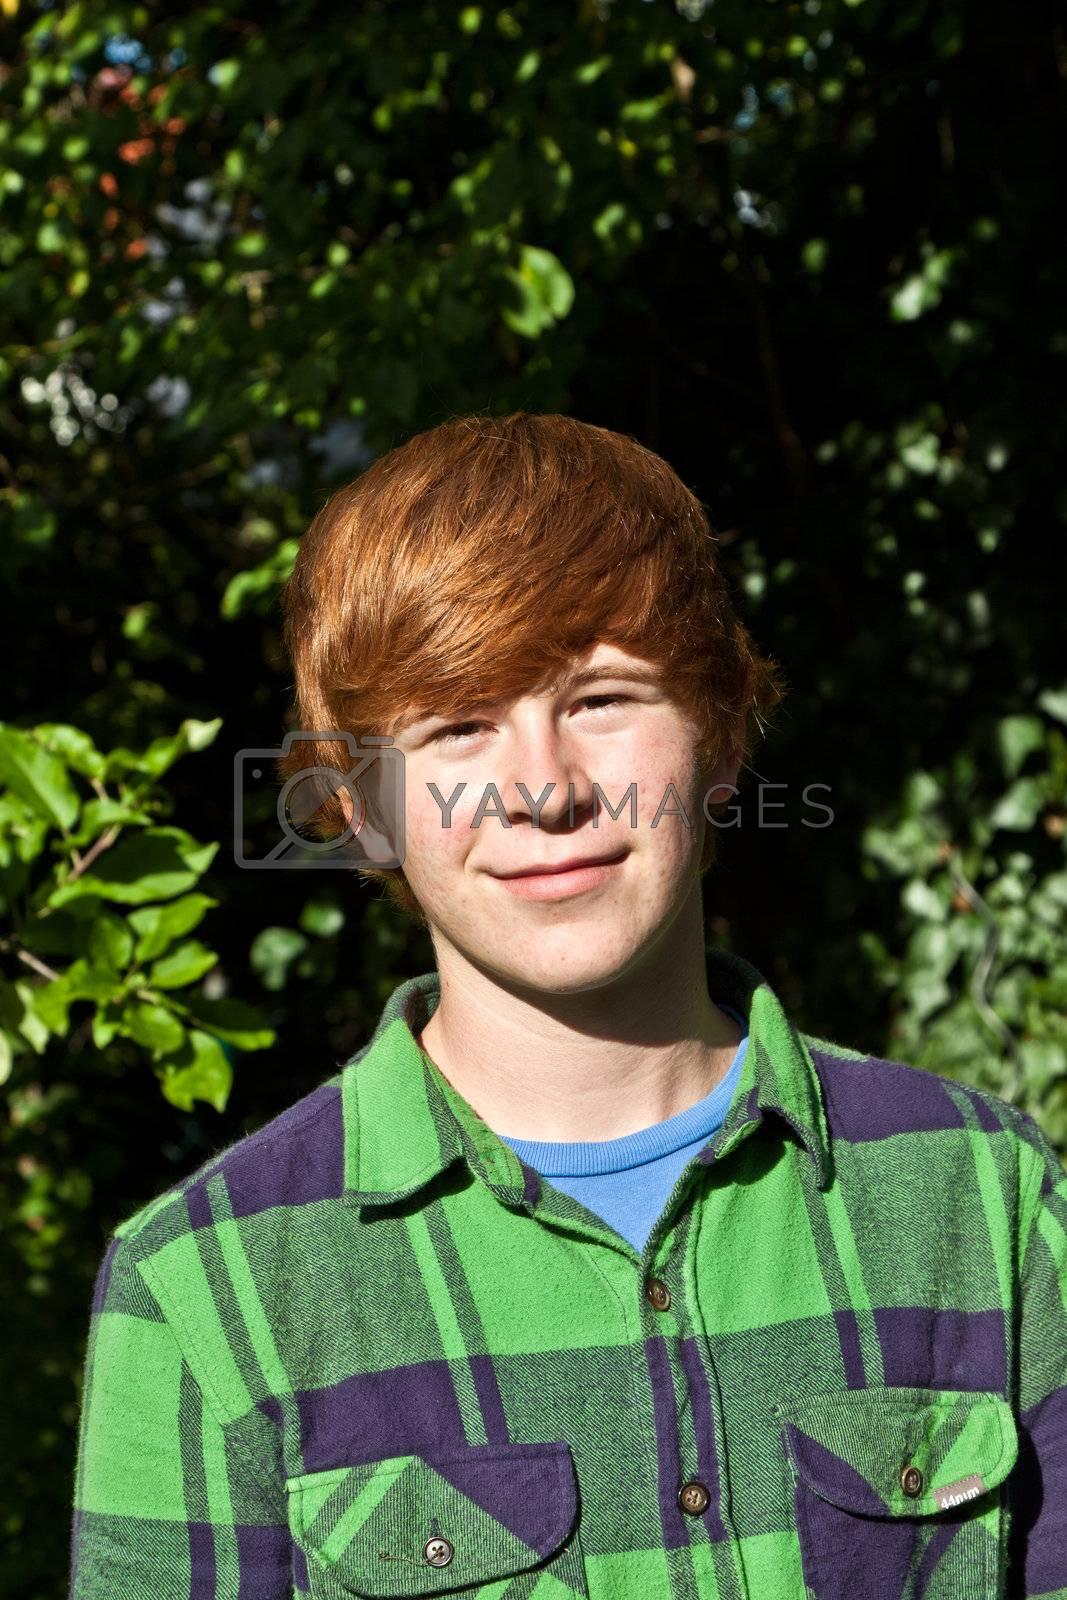 portrait of attractive happy smiling boy in the garden